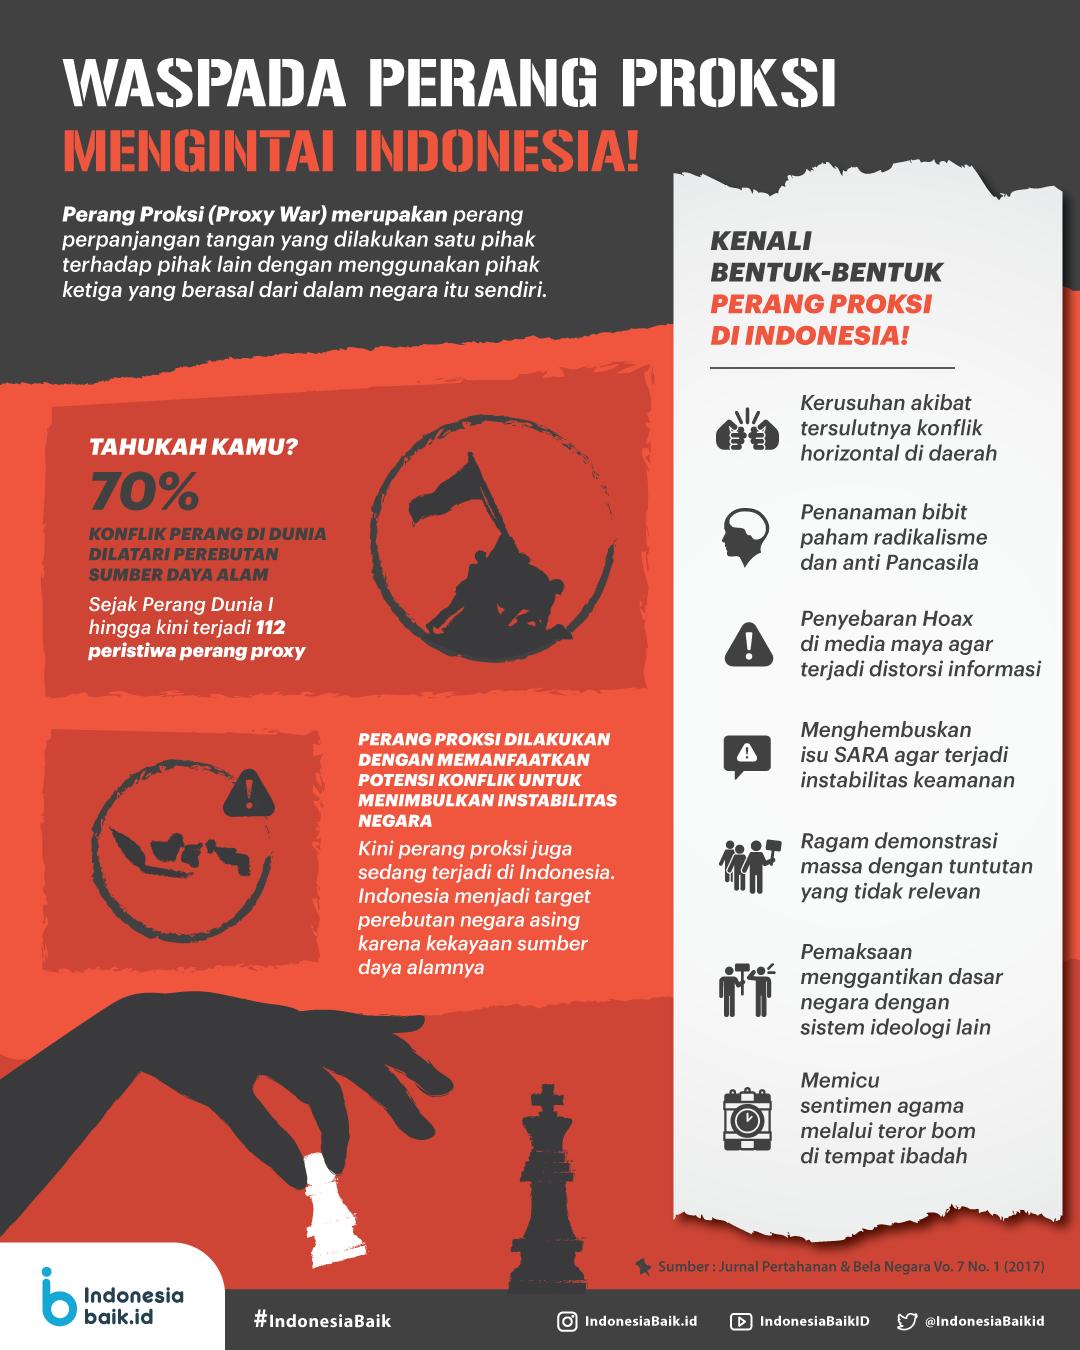 Waspada Perang Proxy Mengintai Indonesia